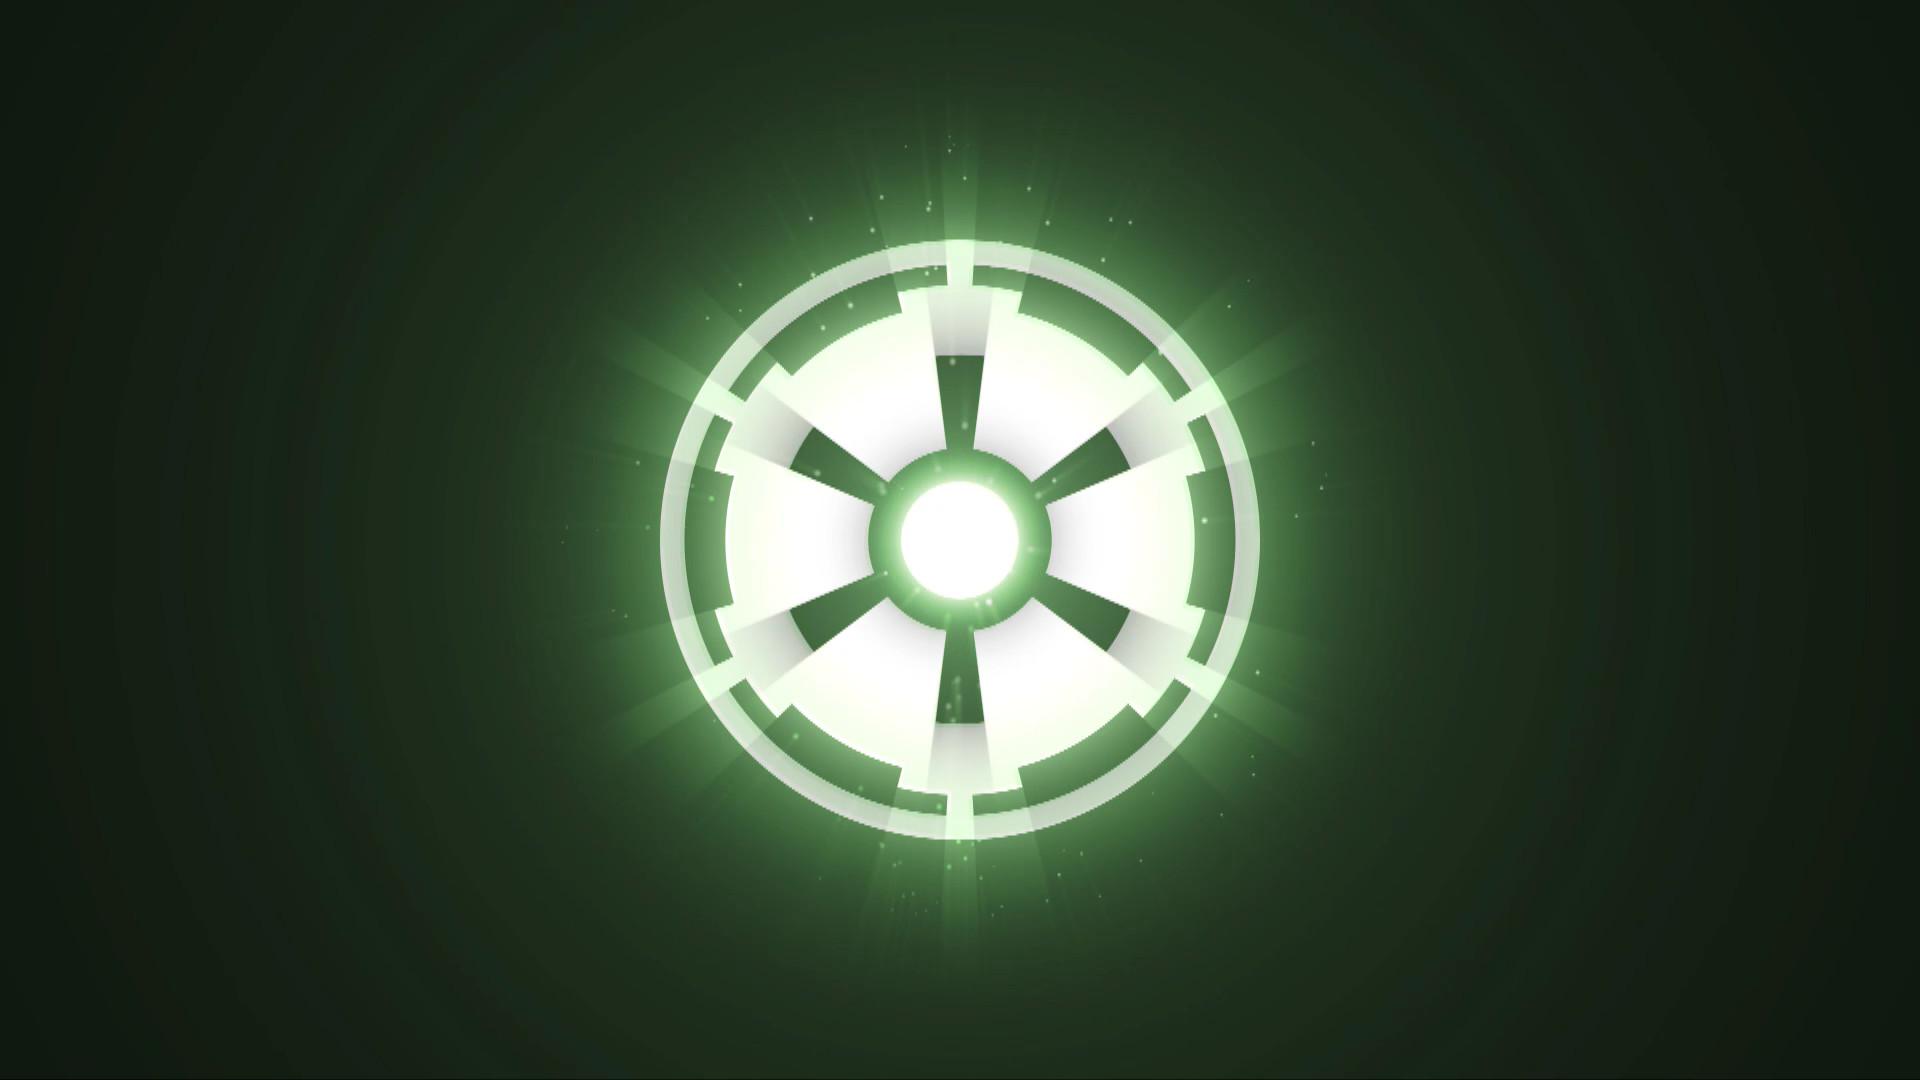 Report Rss Imperial Desktop Data Src Star Wars Rebel Imperial Logo 1920x1080 Download Hd Wallpaper Wallpapertip